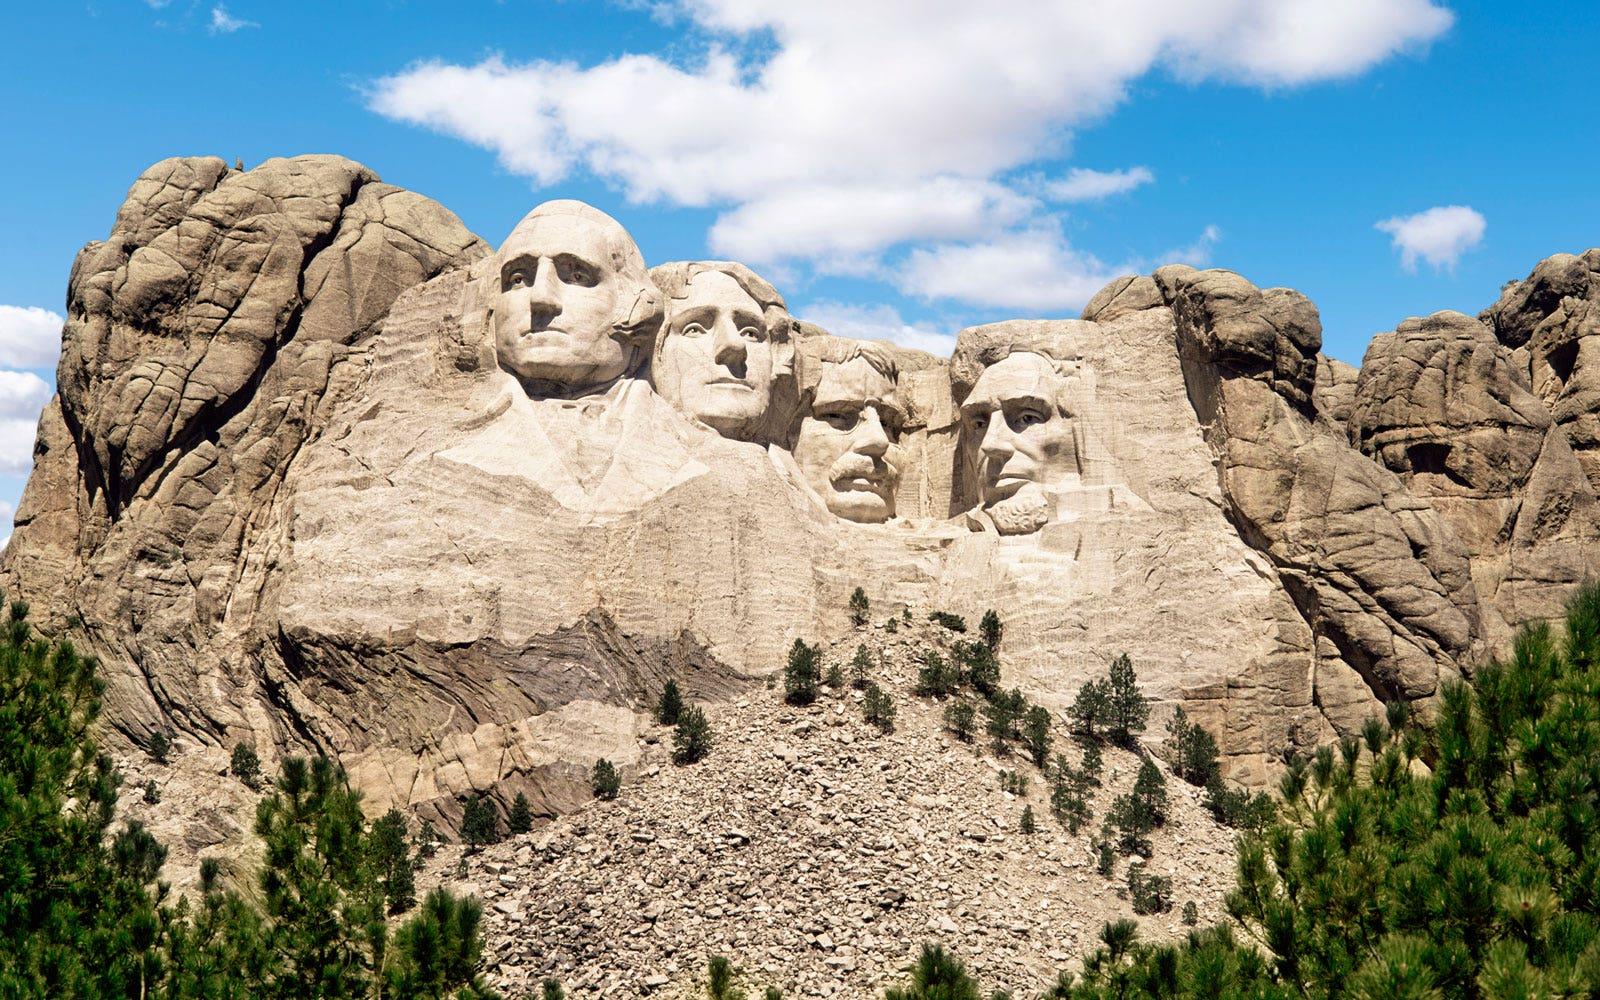 CNN slights Mount Rushmore as